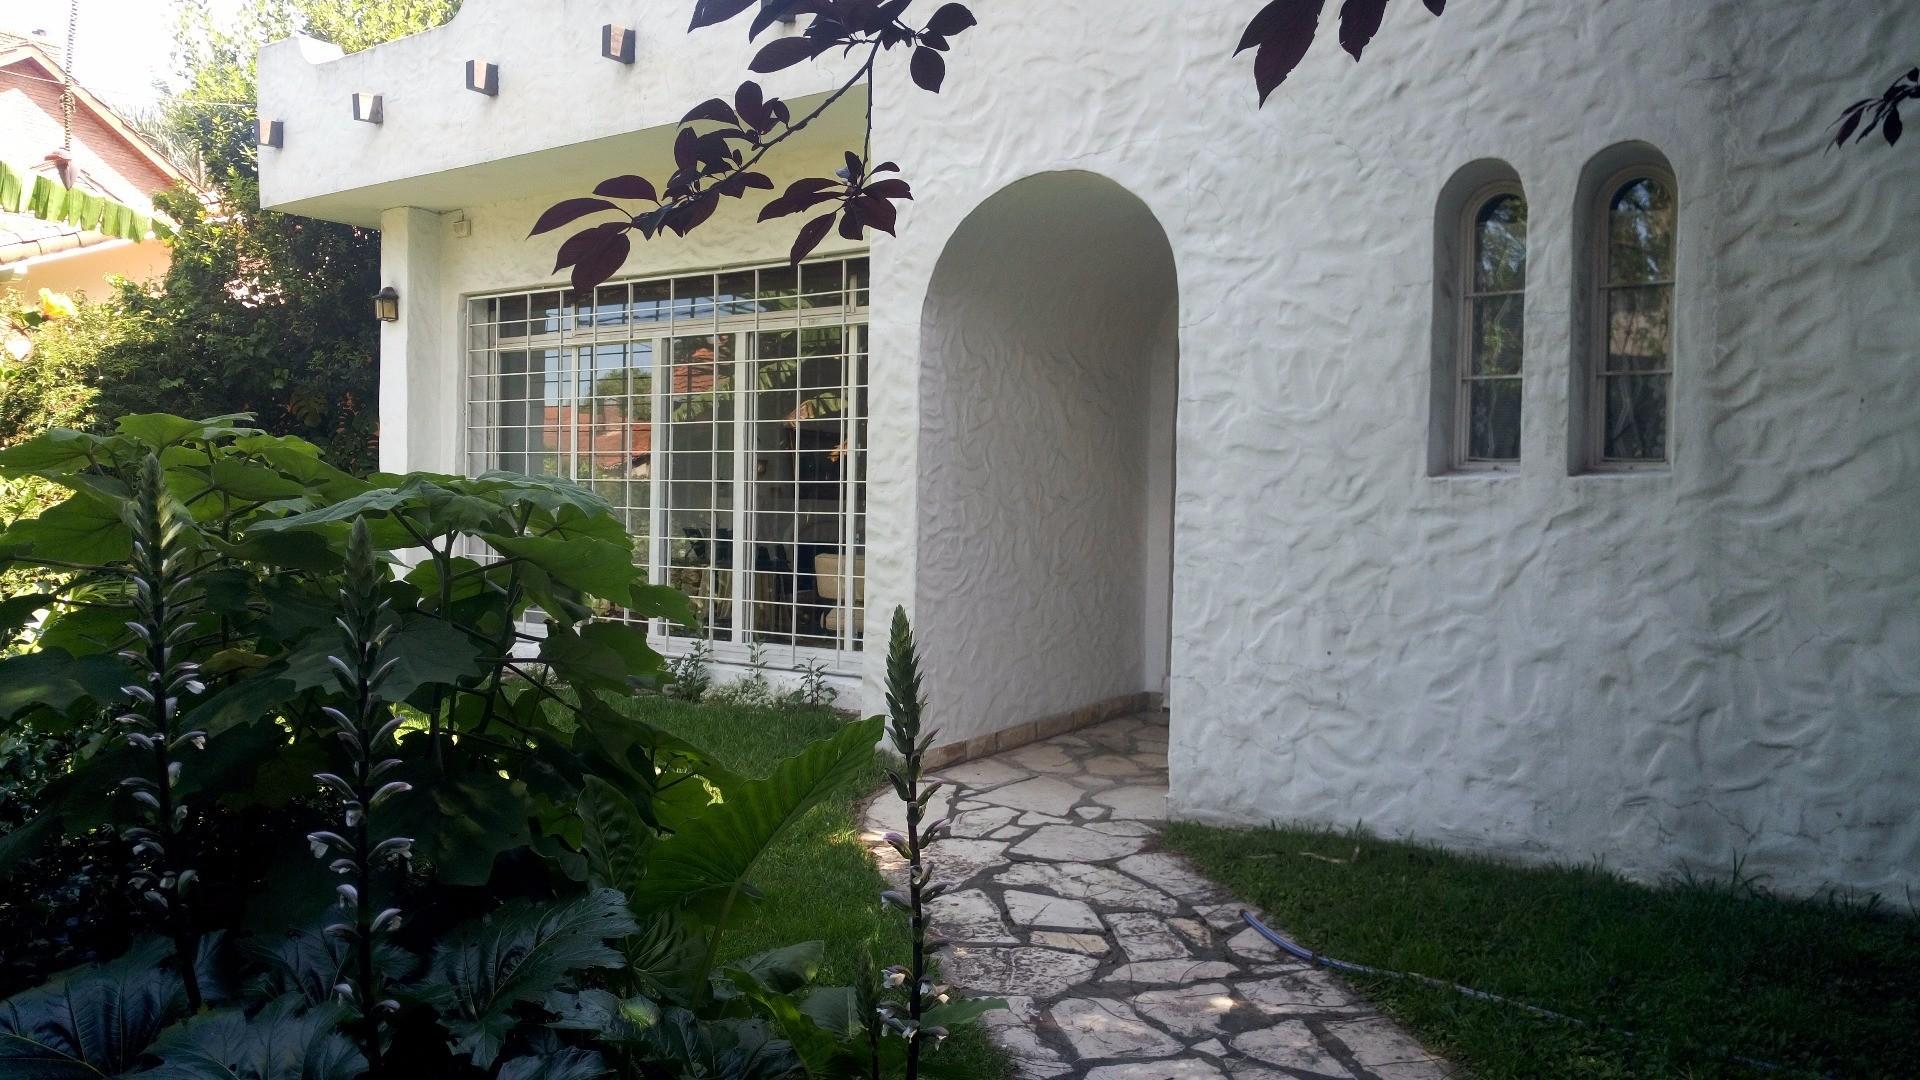 chalet-casa-casa quinta-pileta.parque-GBA-BARRIO SANTA RITA-600MTS terreno-290CUBIERTO.4 dormis